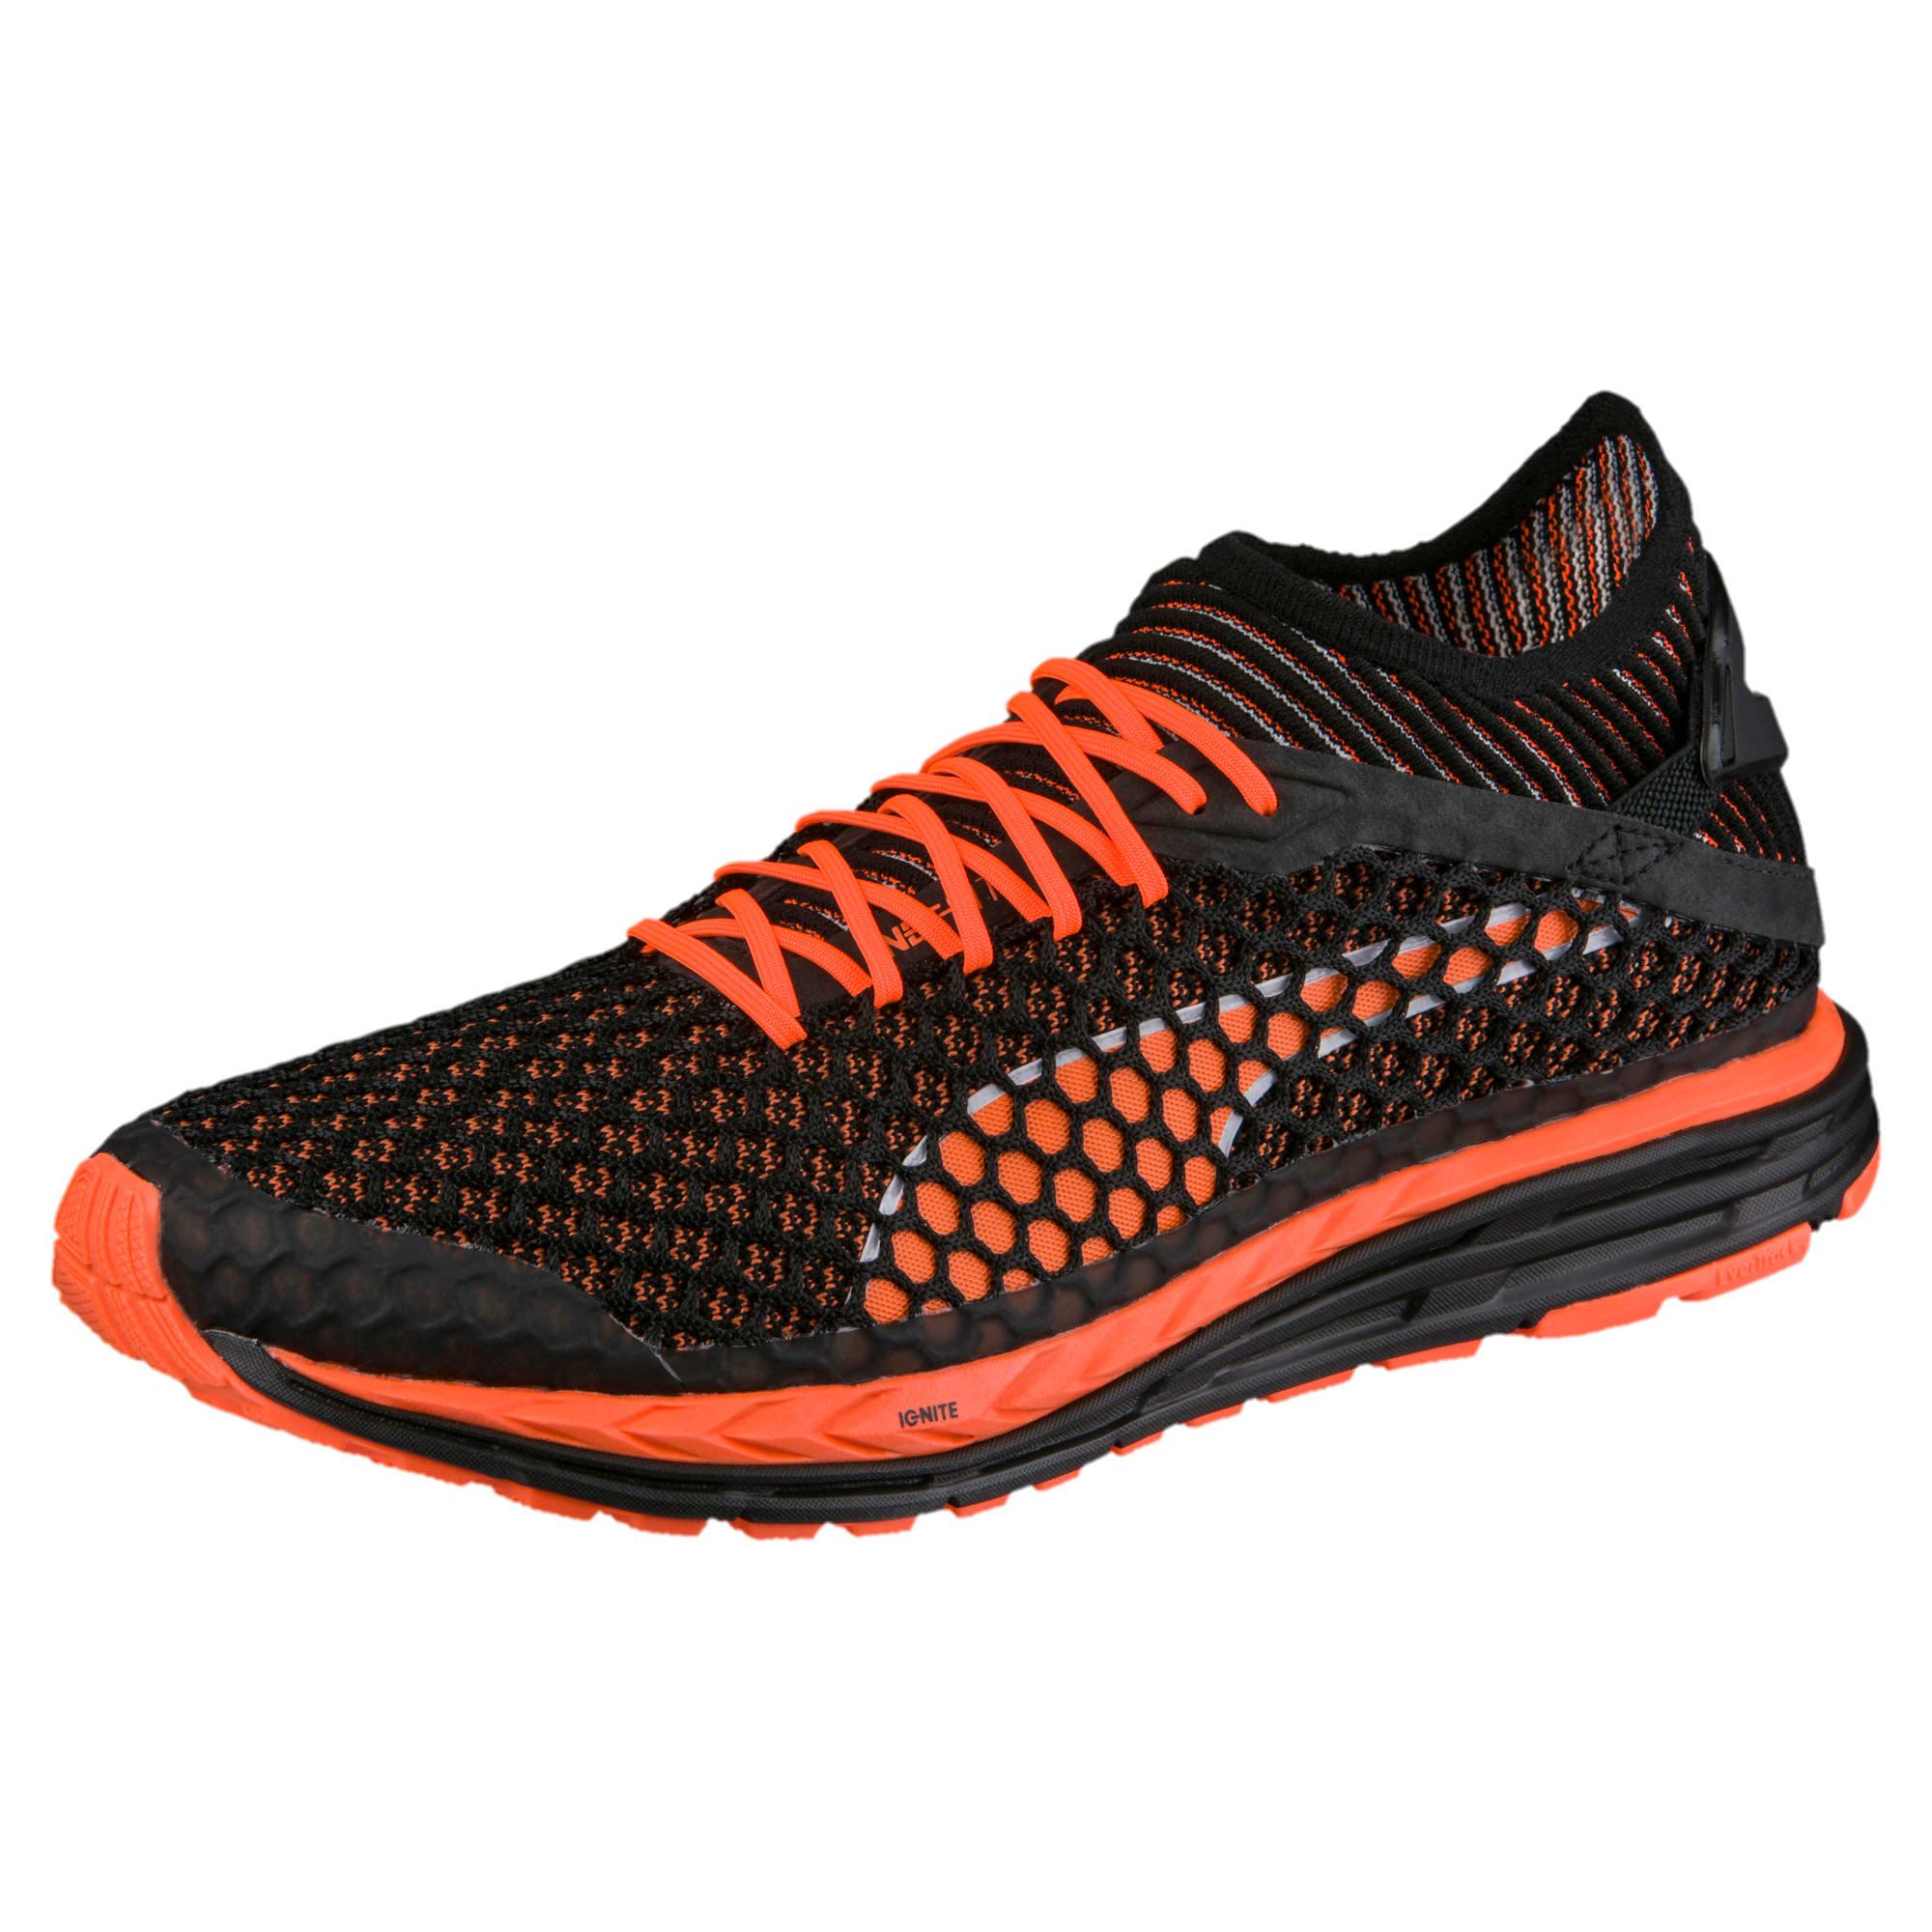 Thumbnail 3 of Speed IGNITE NETFIT Men's Running Shoes, Black-Shocking Orange-White, medium-IND